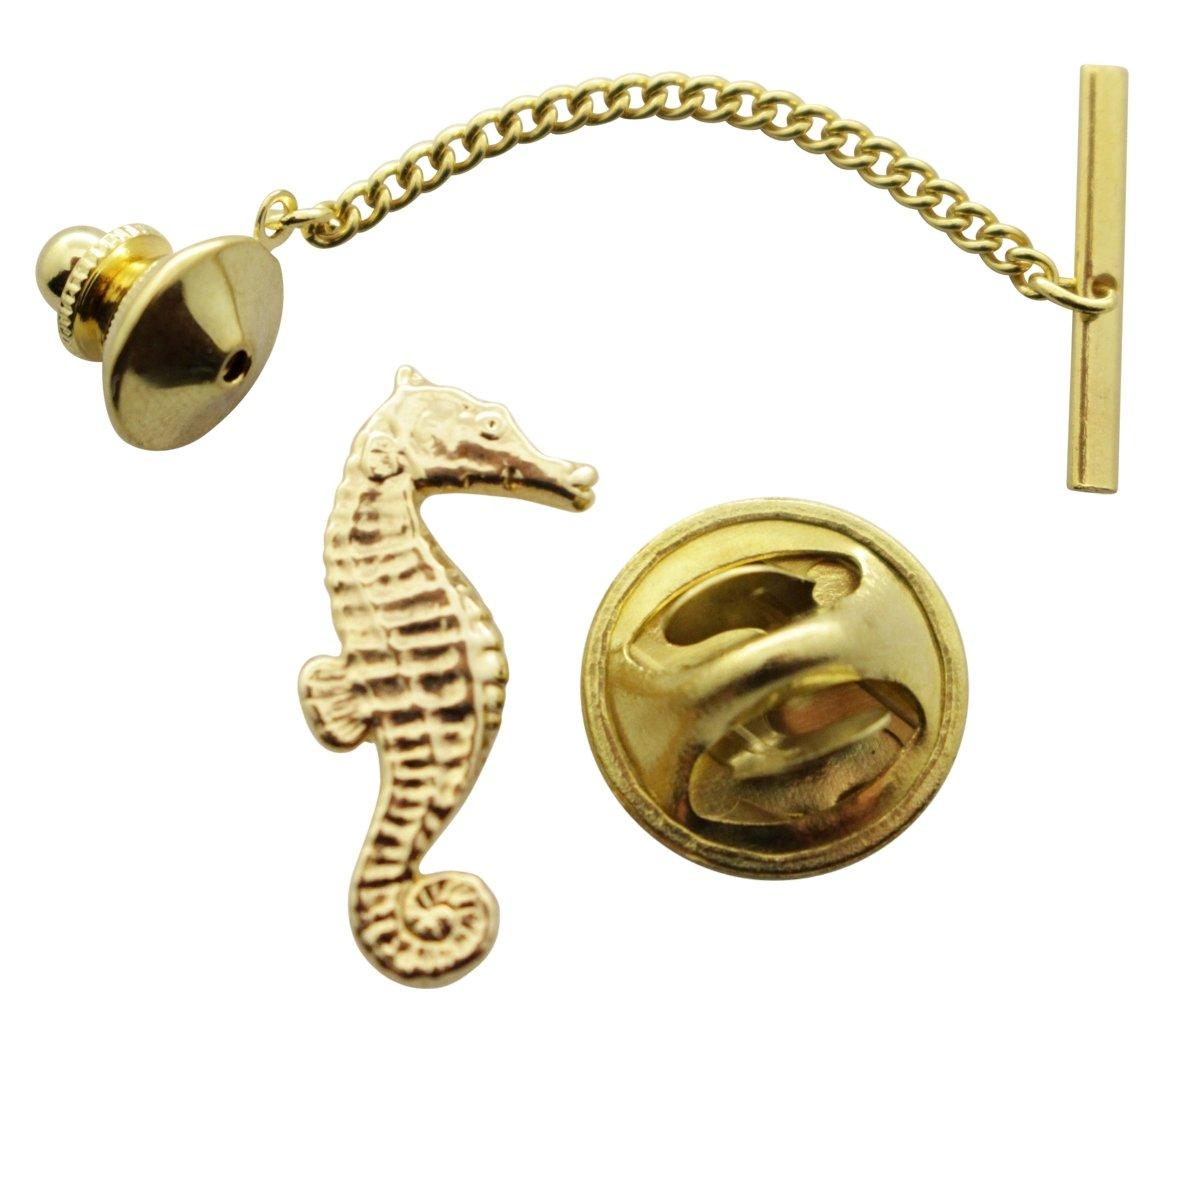 Seahorse Tie Tack ~ 24K Gold ~ Tie Tack or Pin ~ Sarah's Treats & Treasures by Sarah's Treats & Treasures